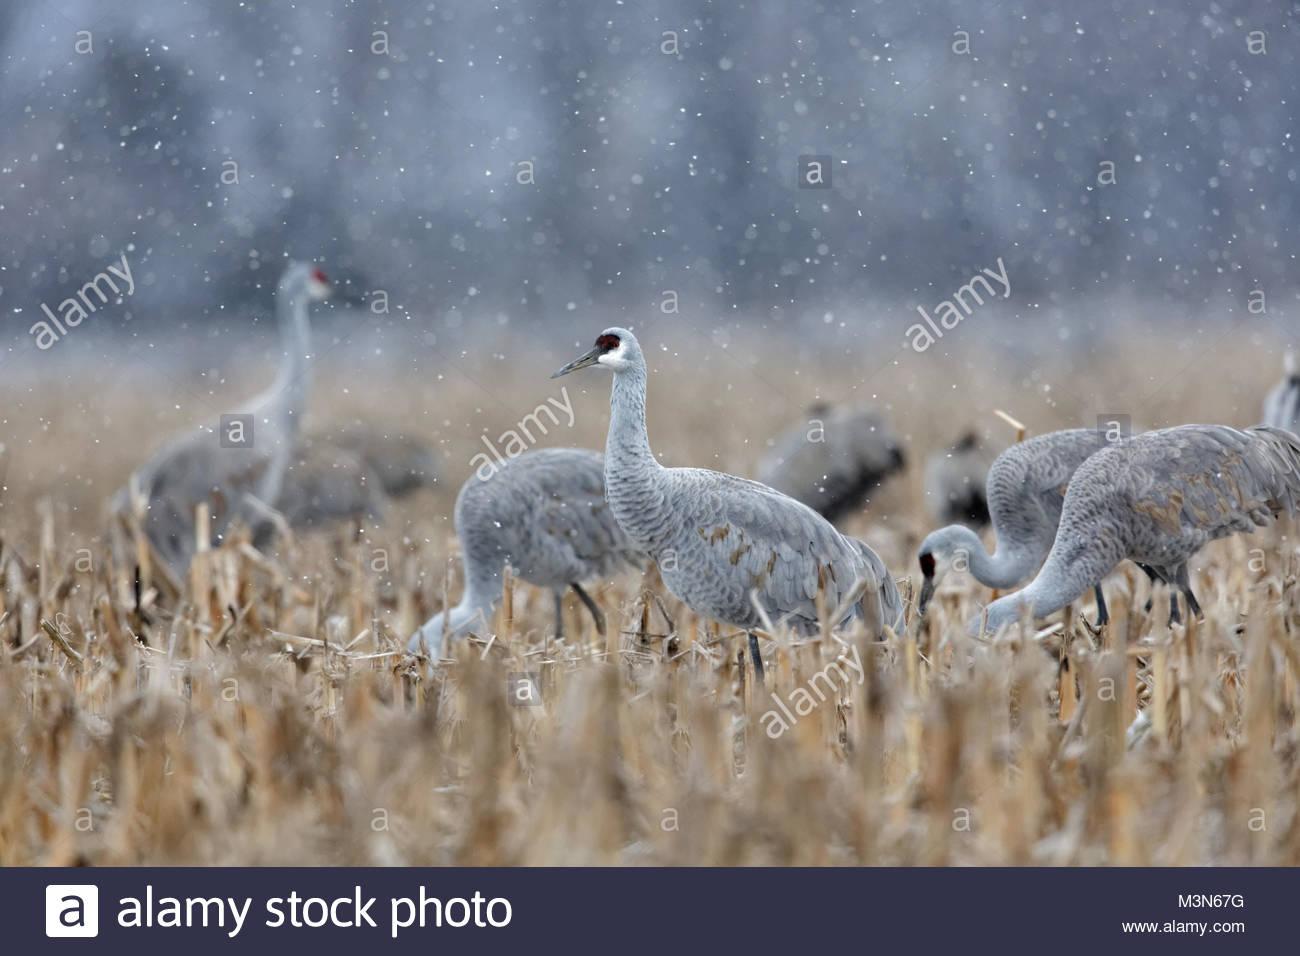 Sandhill Cranes in snow storm - Stock Image